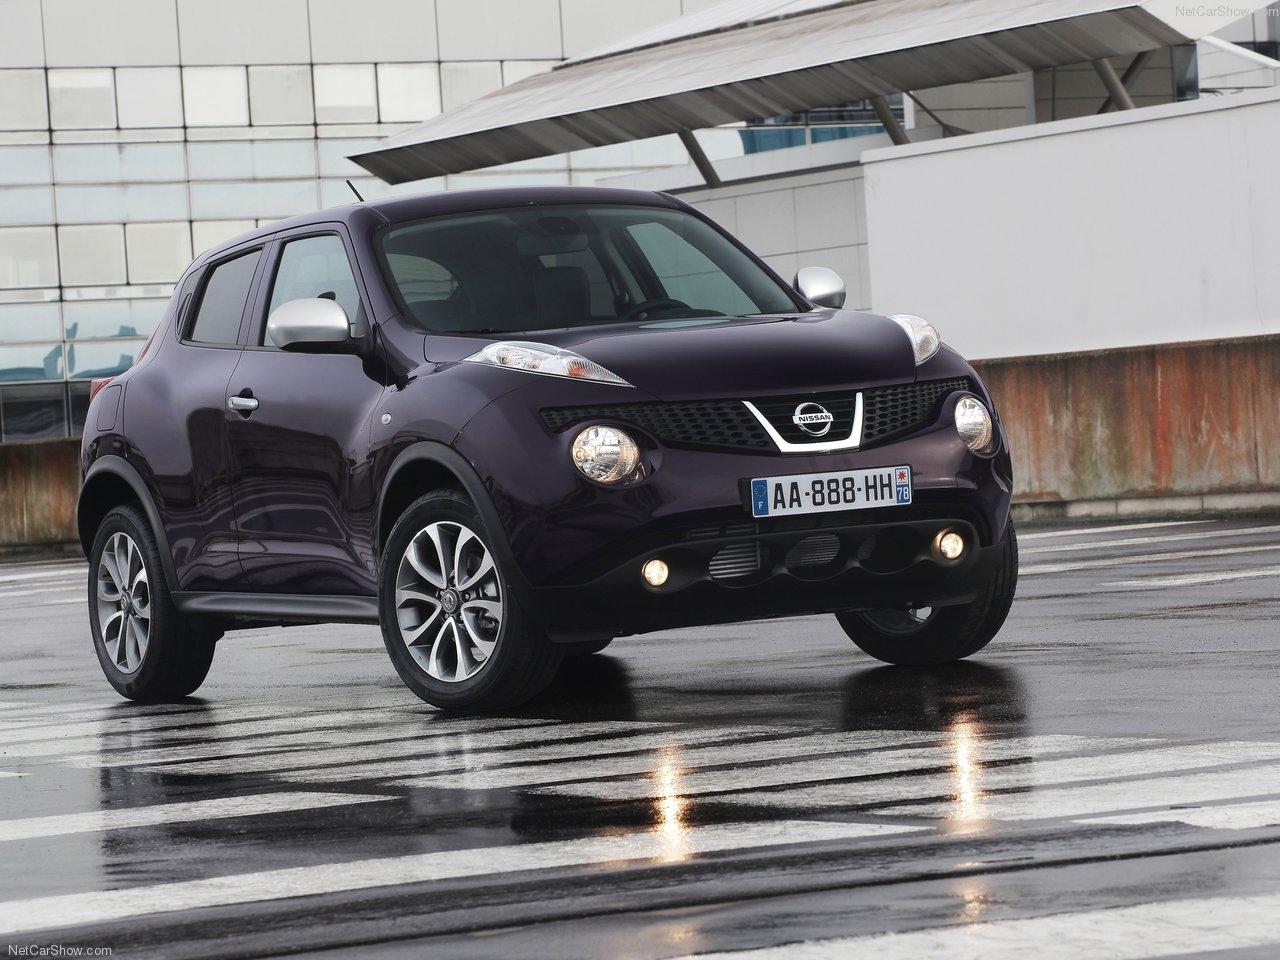 http://4.bp.blogspot.com/-0kfzY2EkJU8/Tw5HqOXVUzI/AAAAAAAAD8E/R3jny05PuyI/s1600/Nissan-Juke_Shiro_2012_1280x960_wallpaper_01.jpg